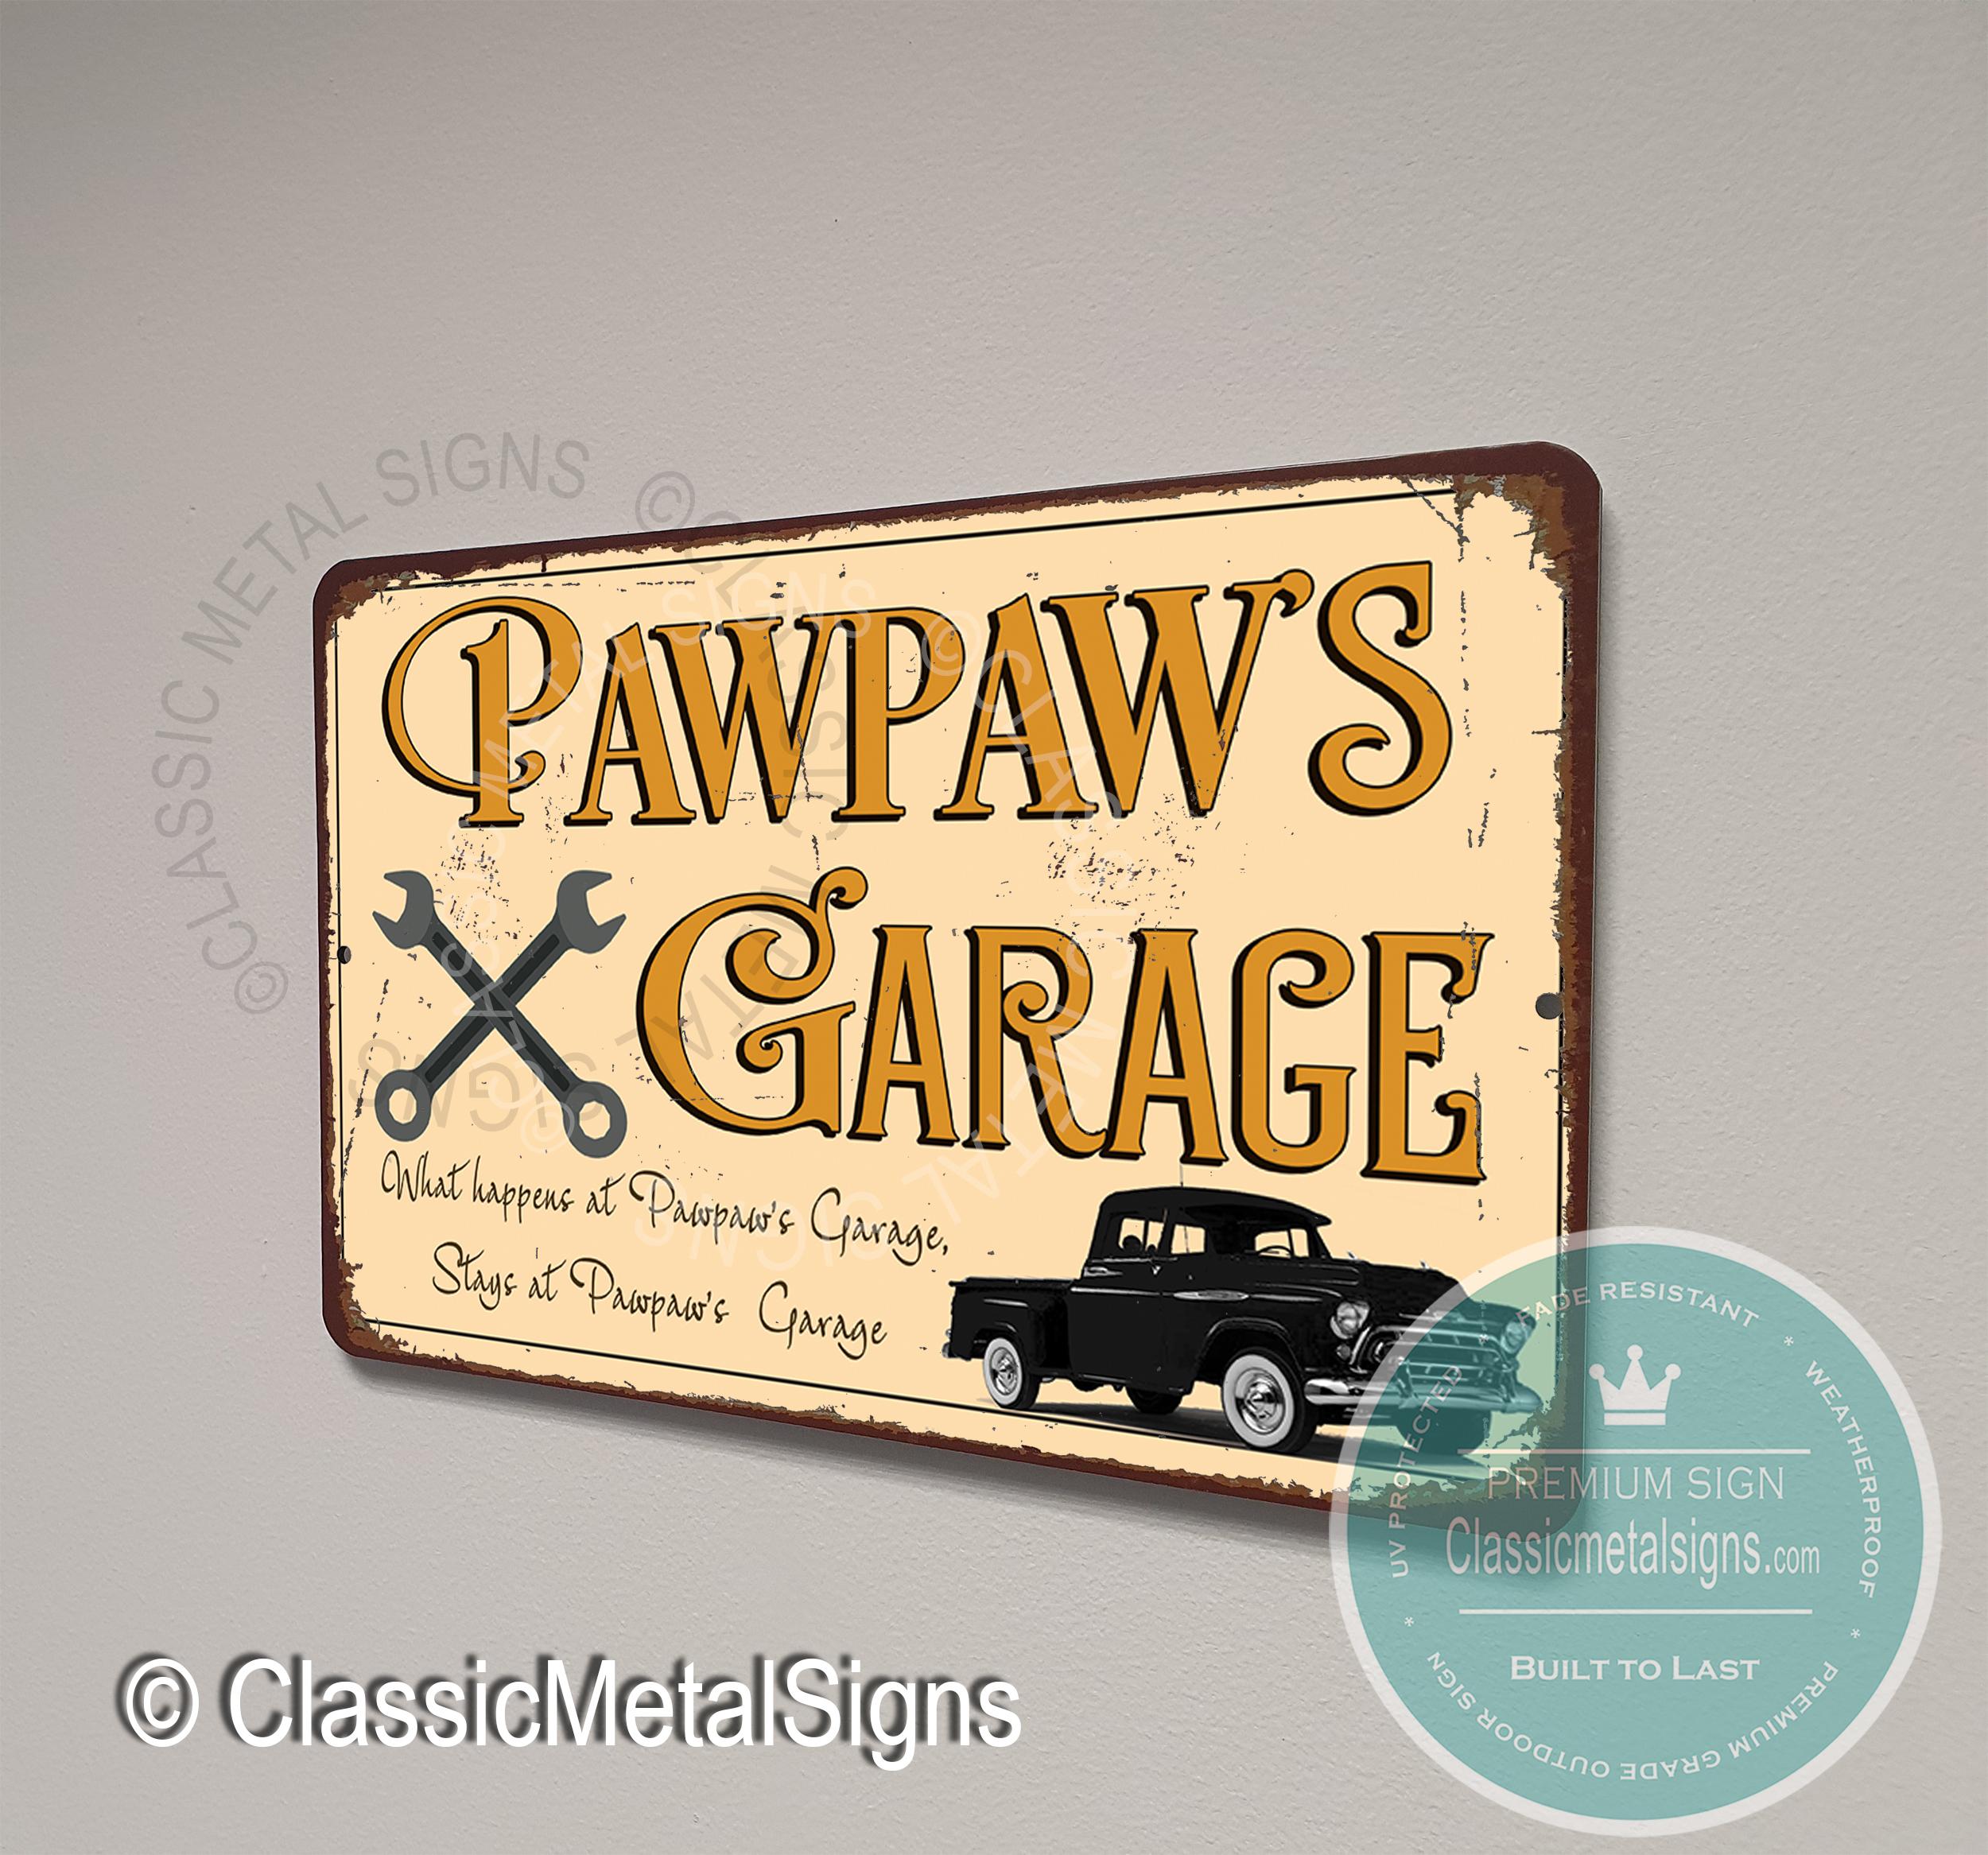 Pawpaw's Garage Signs